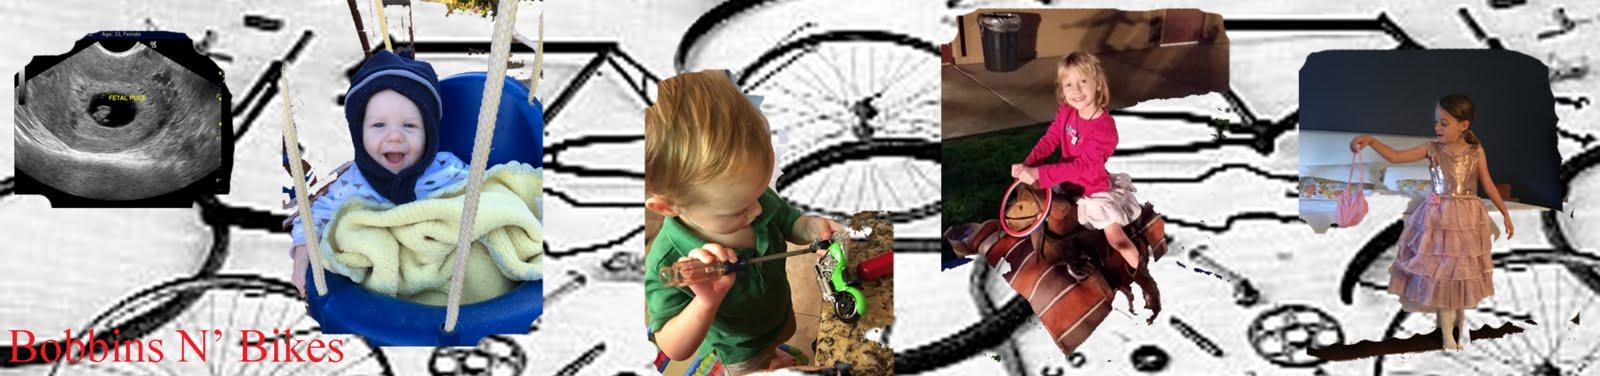 Bobbins N' Bikes